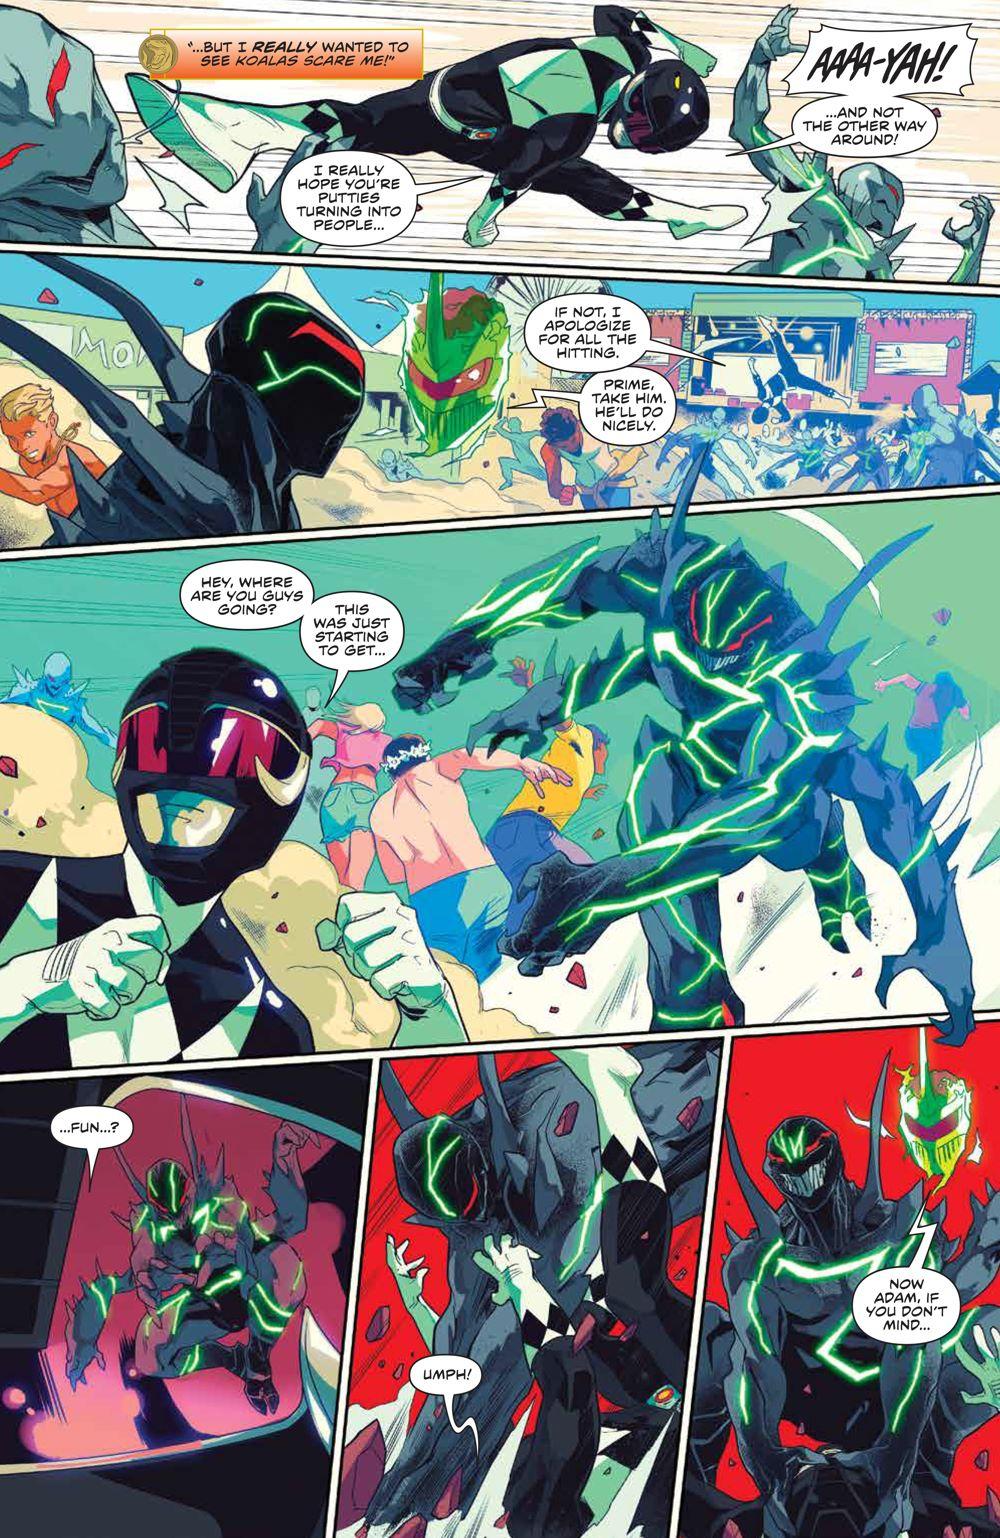 MightyMorphin_003_PRESS_7 ComicList Previews: MIGHTY MORPHIN #3